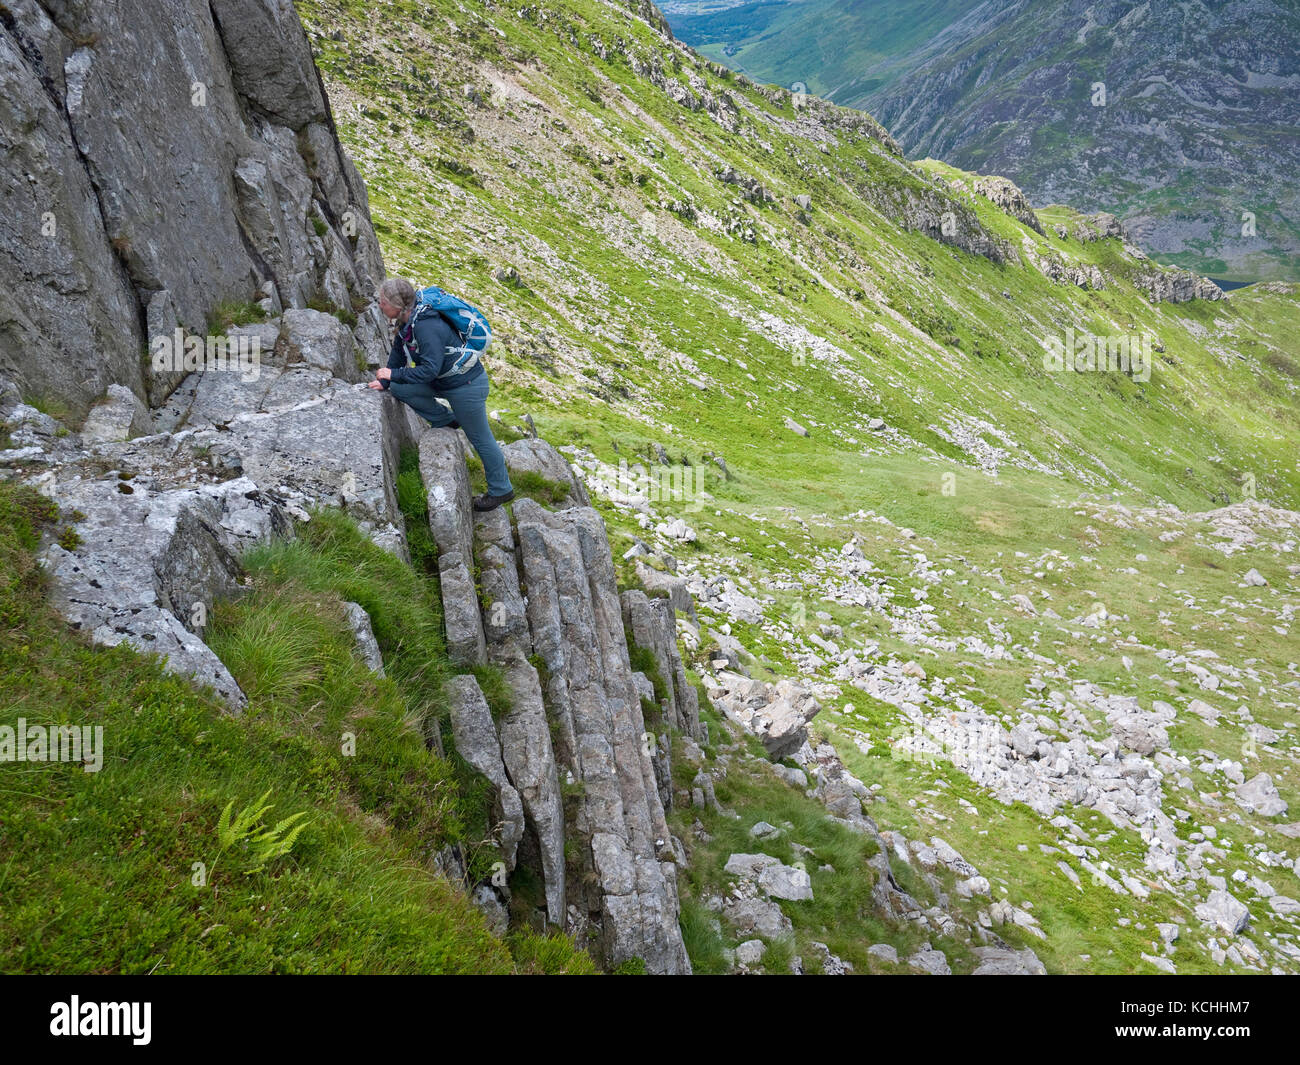 A female hill walker enjoying the grade 1 scramble on 'false' Gribin, a rocky ridge on Snowdonia's Glyderau - Stock Image